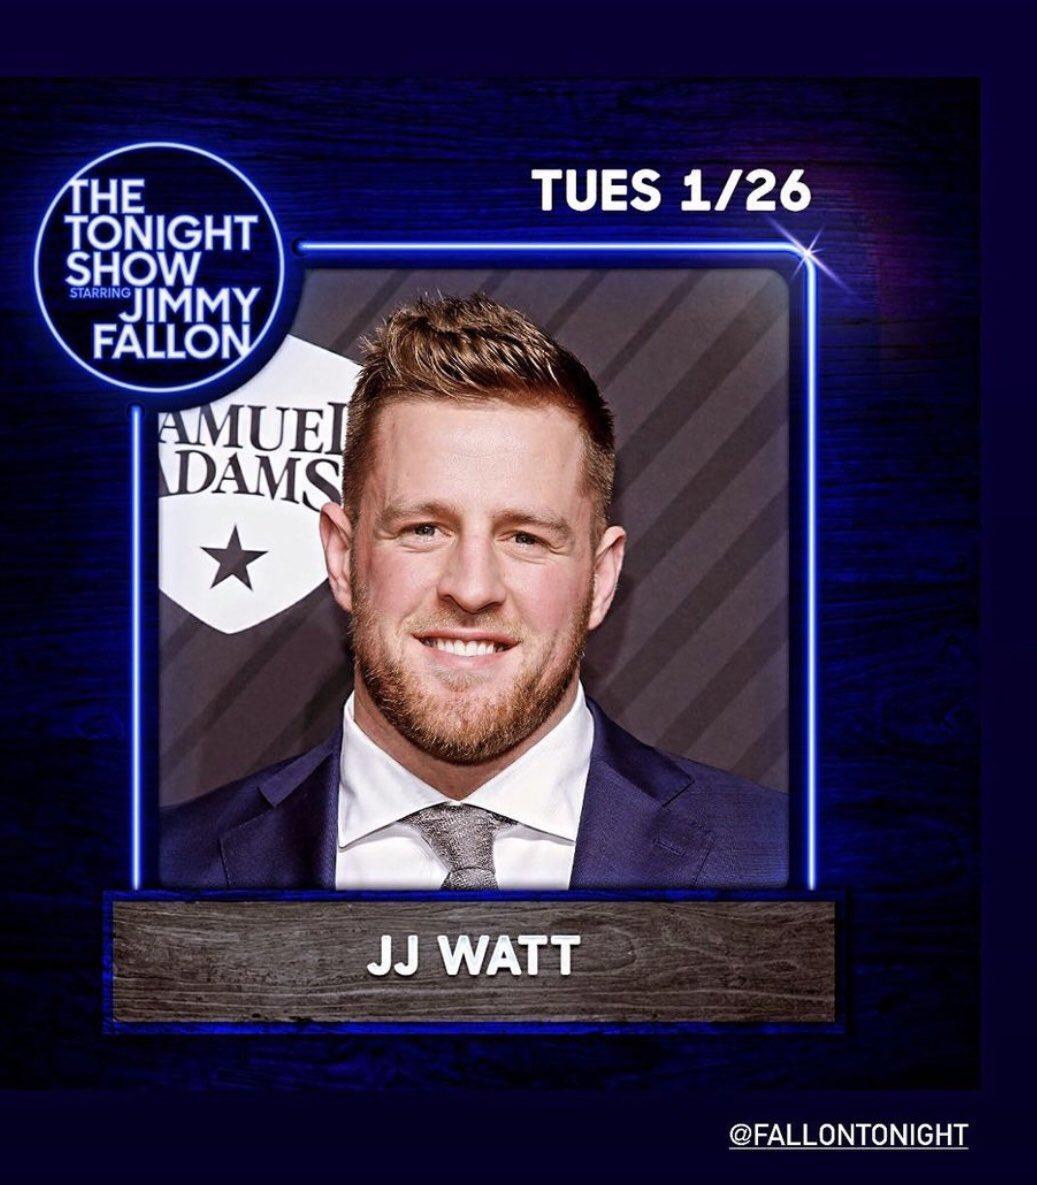 Awwwwww, I was reading my FB memories and saw that @JJWatt was on @jimmykimmel on this day in 2015! Guess what? He's on @jimmyfallon tonight!  Go JJ! #WeAreTexans #TheTonightShow